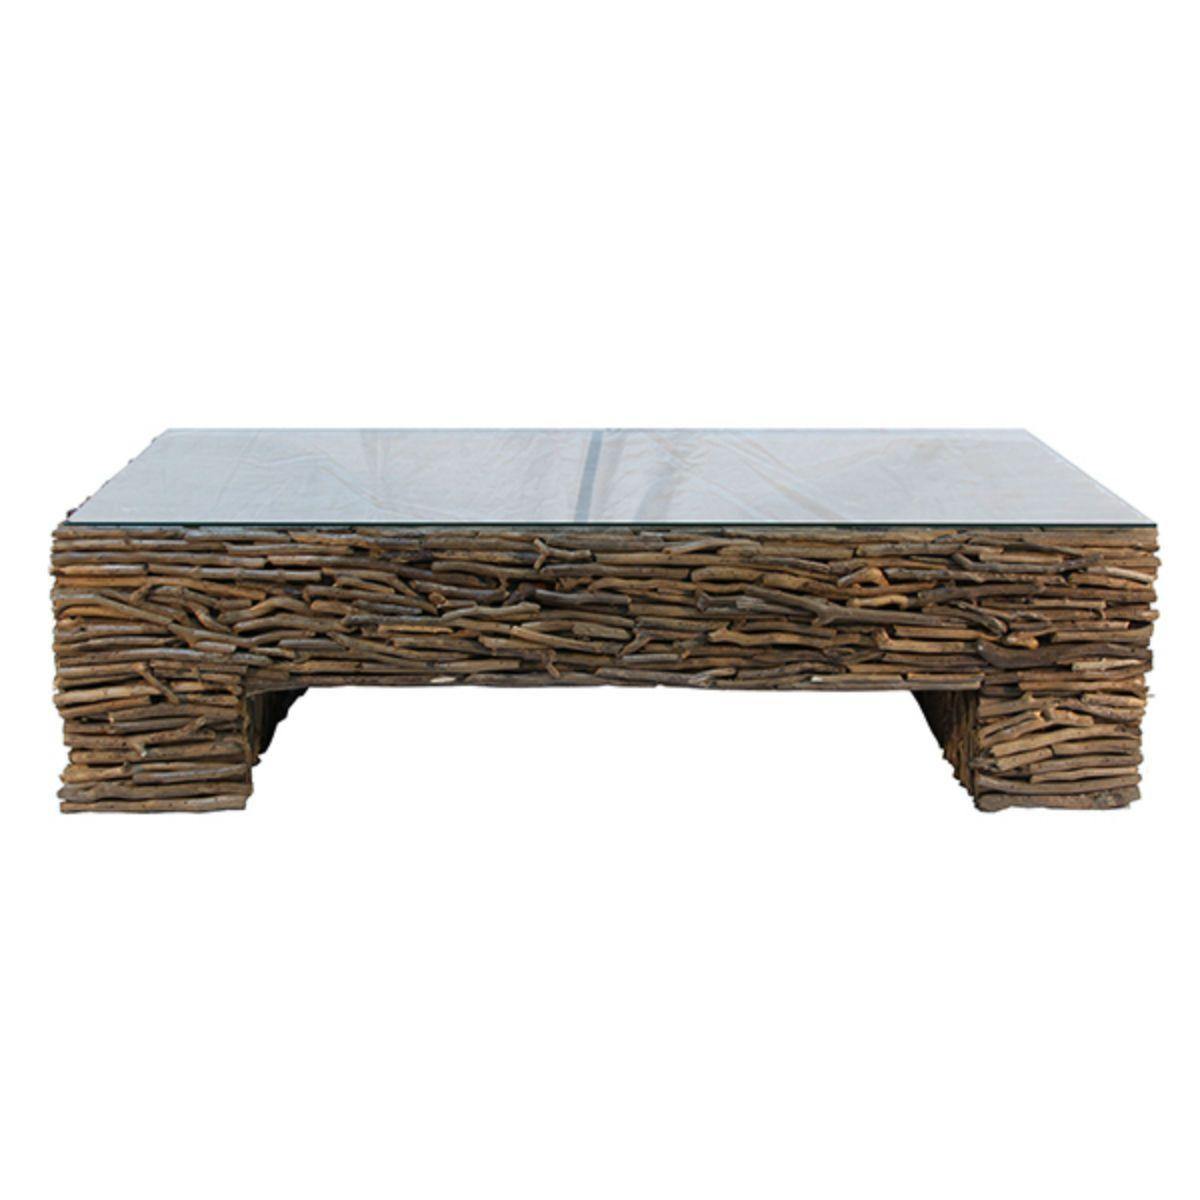 Driftwood cocktail table w glass 56l x 31w x 15h